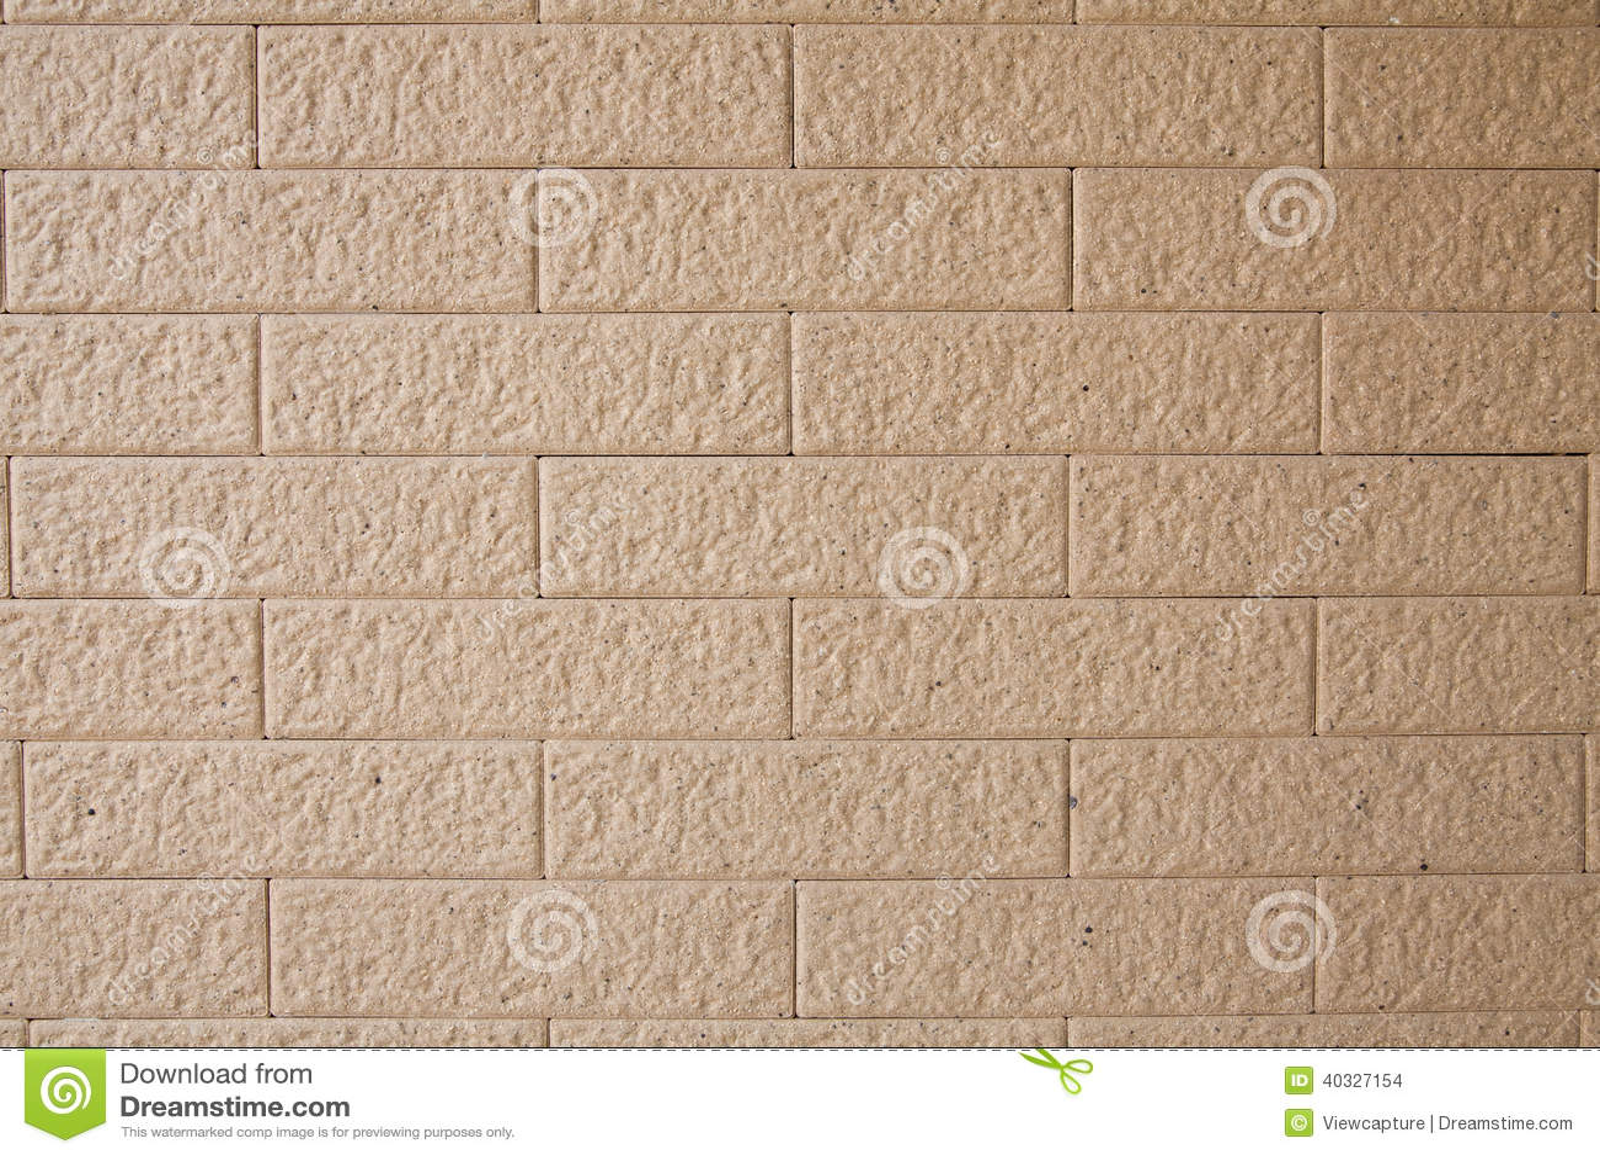 Awesome 12X12 Ceramic Floor Tile Big 12X12 Interlocking Ceiling Tiles Square 12X24 Slate Tile Flooring 2 X 4 Ceiling Tile Young 2X4 Ceiling Tiles Black4X4 Ceramic Tile Unglazed Ceramic Tile In Brick Pattern Stock Photo   Image Of ..